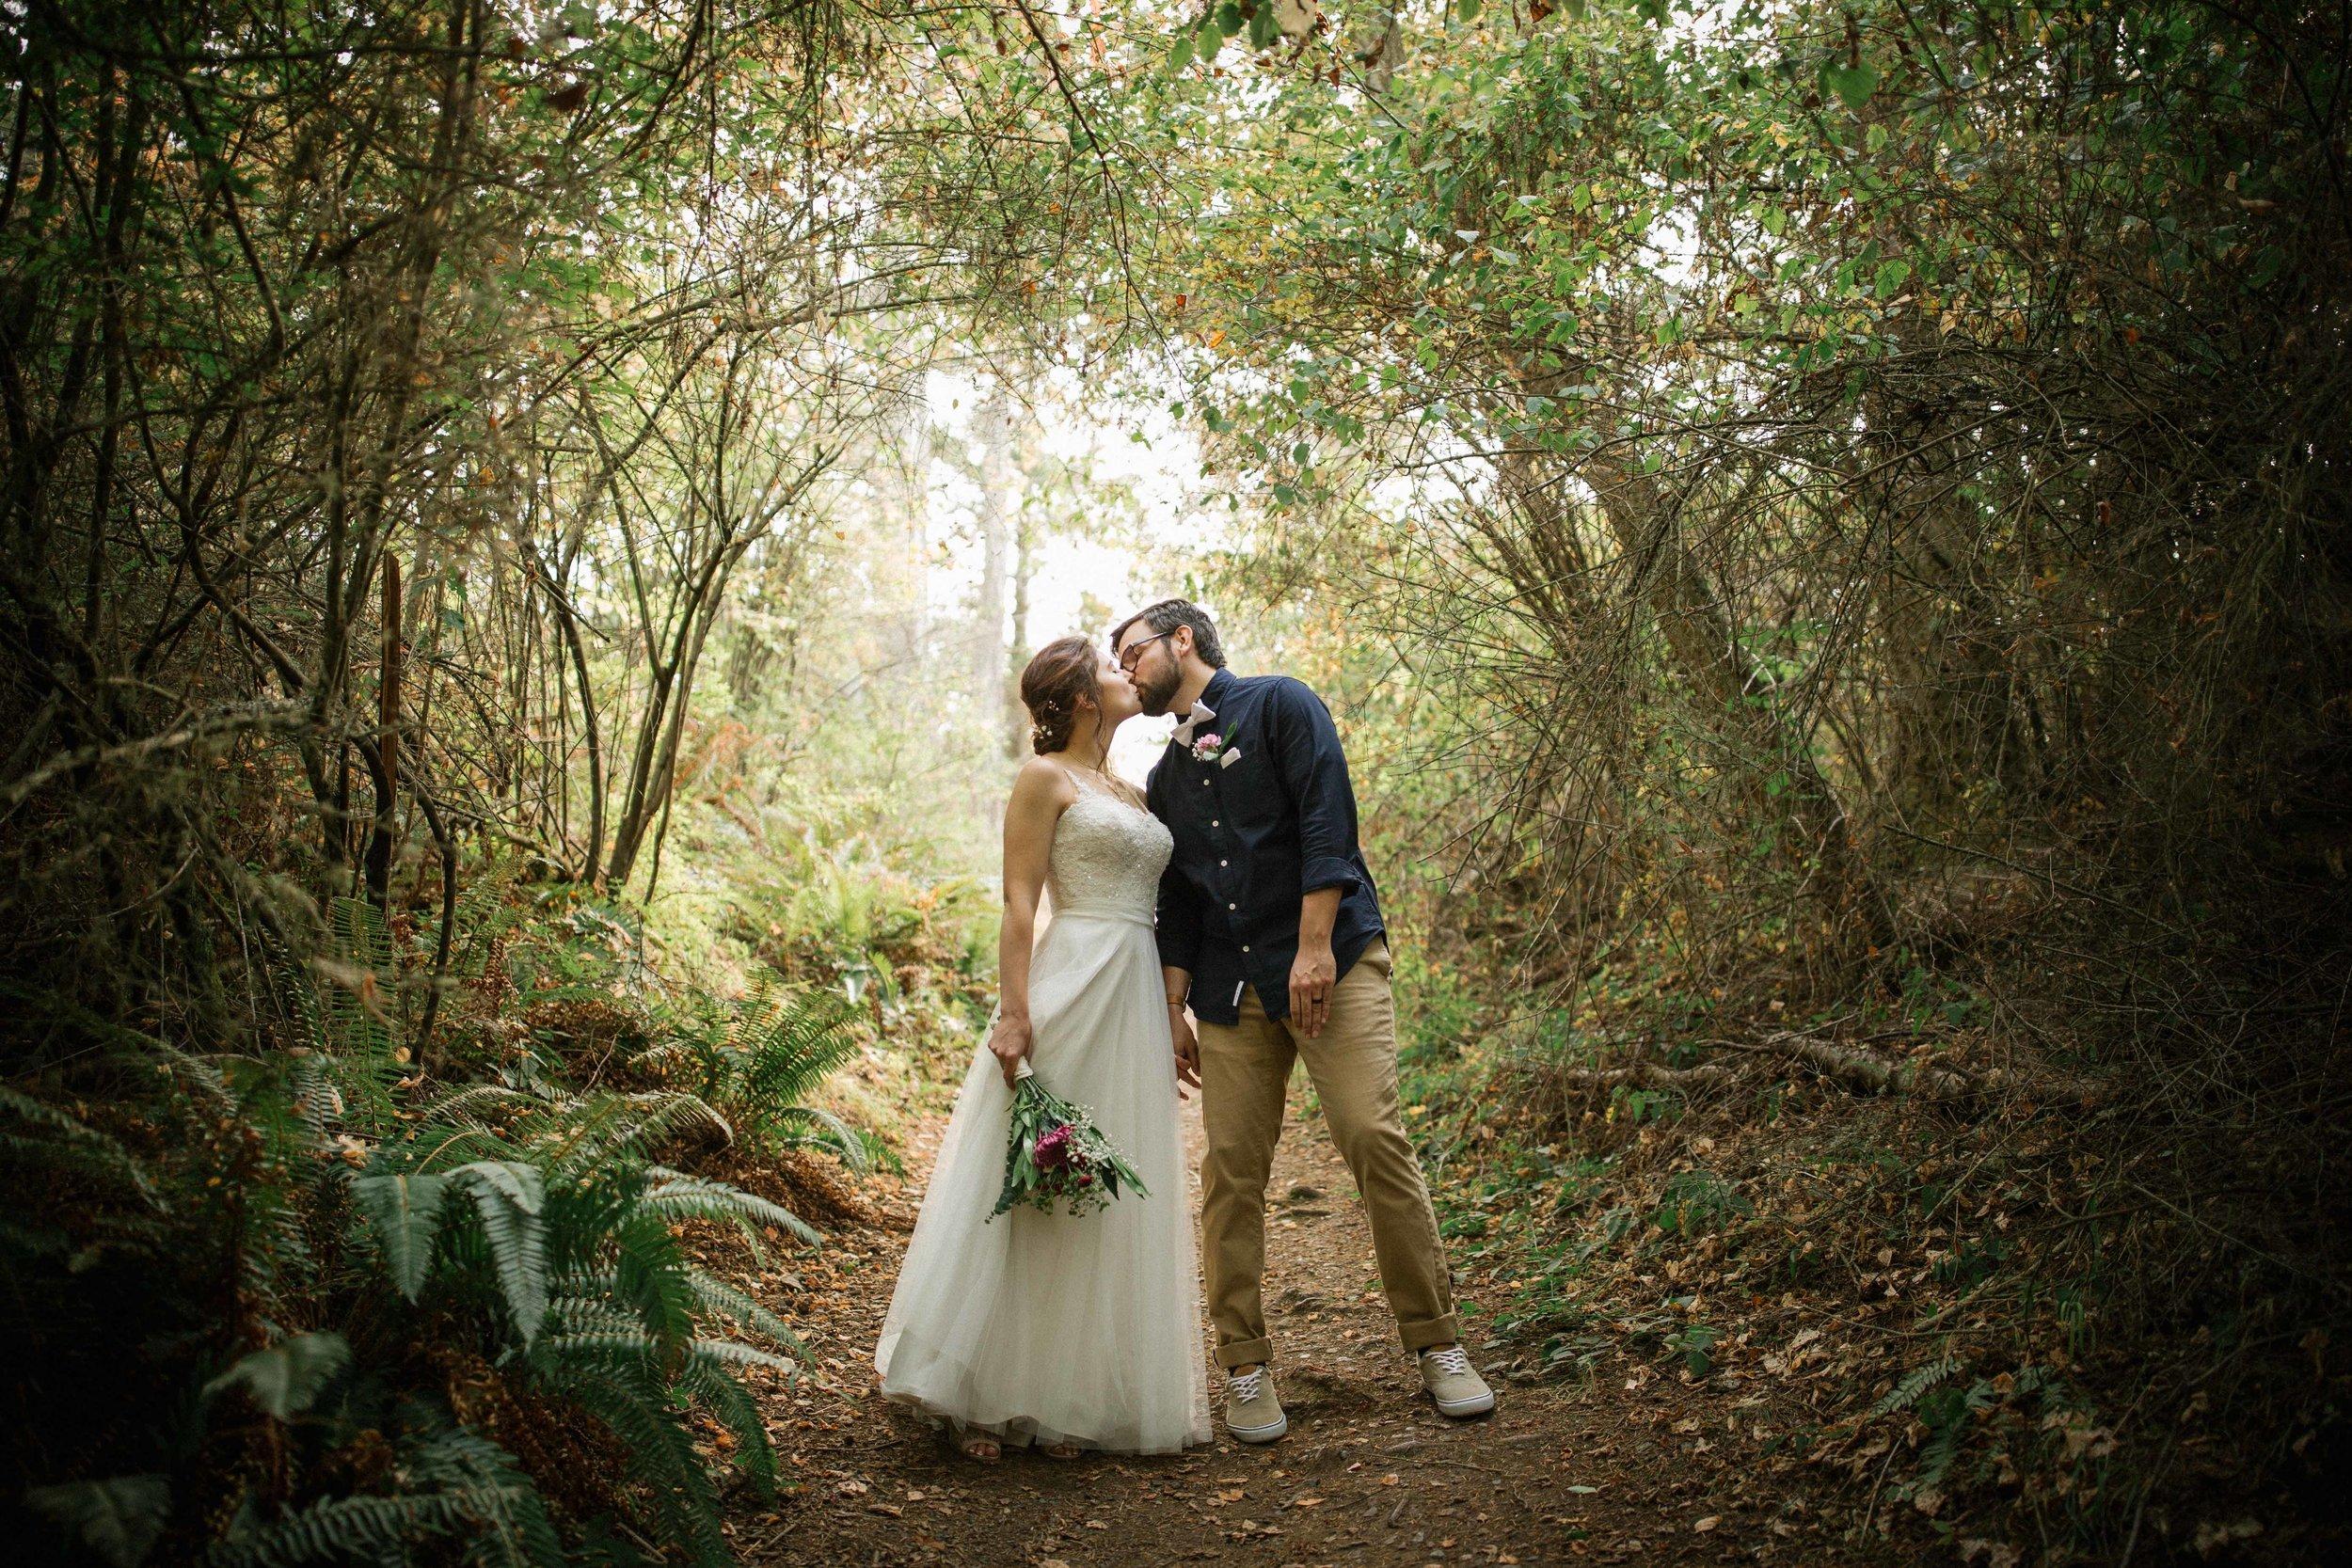 deception-pass-wedding-51.jpg